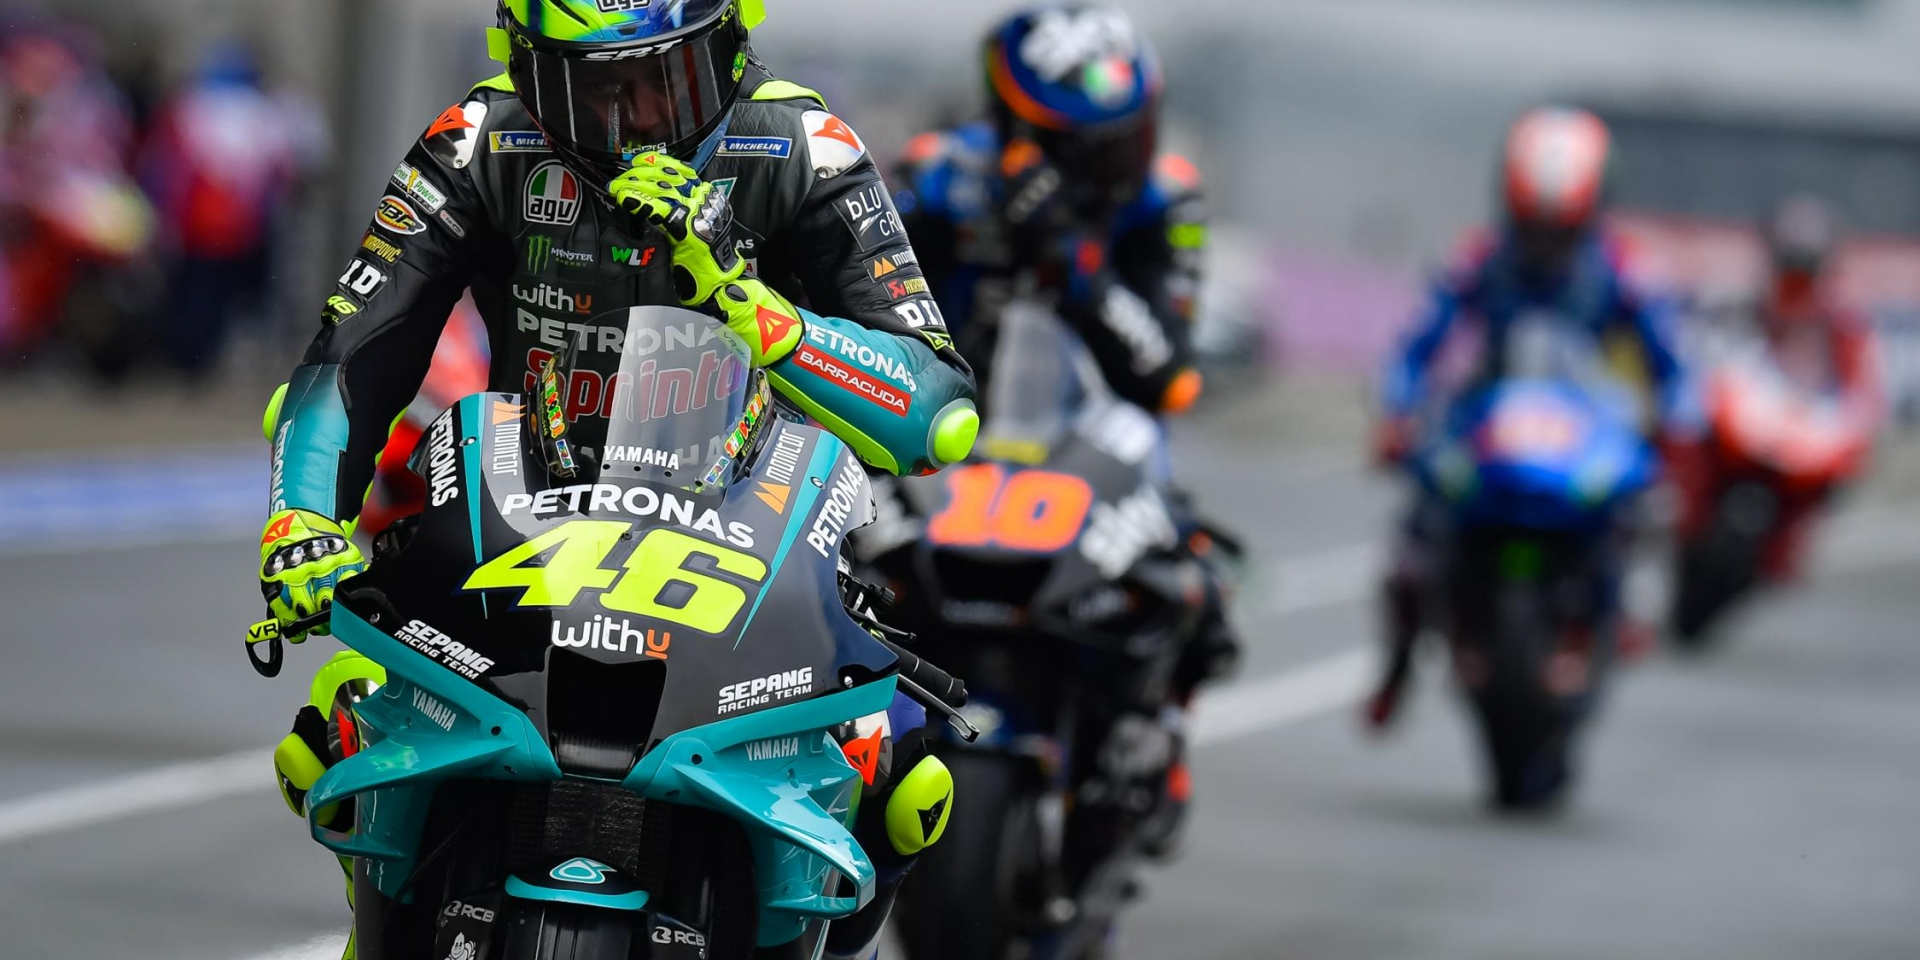 年輕有為知進退!Valentino Rossi:Fabio Quartararo正在做出一些改變!